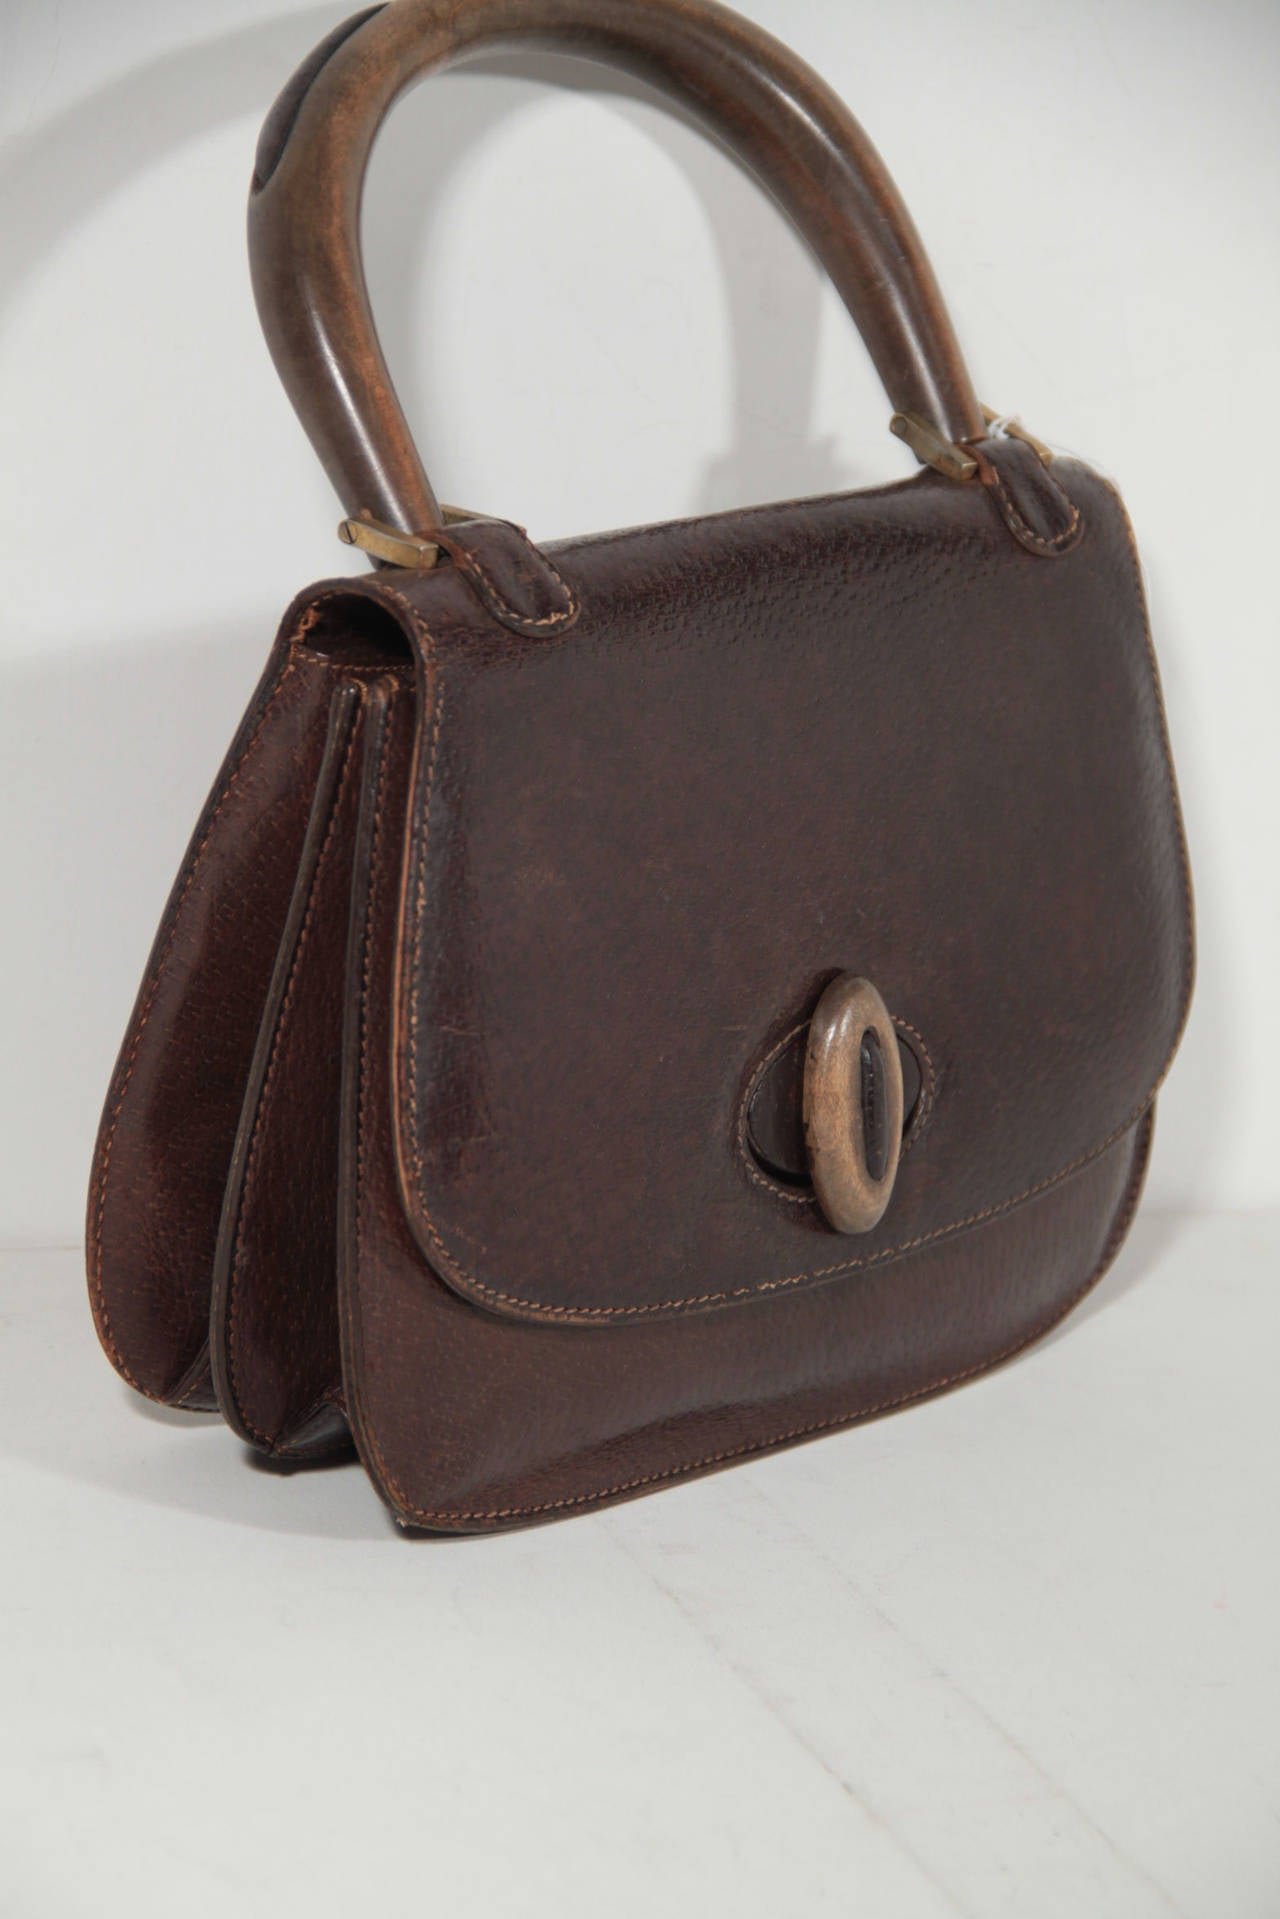 Gucci Vintage 60s Brown Leather Handbag Top Wood Handle